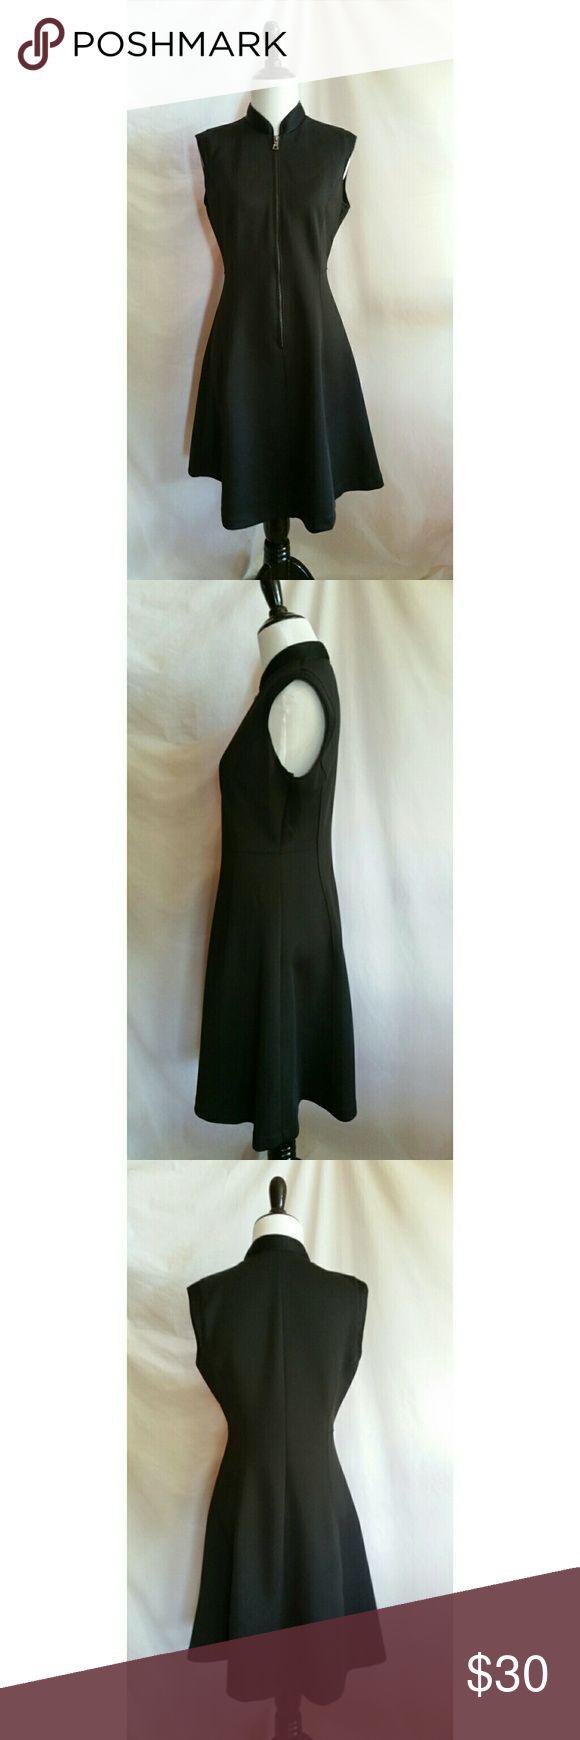 Elie Tahari Size 6 Black Sleeveless Dress Elie Tahari for Design Nation.  Front zipper.  92% polyester, 8% spandex.  Machine washable Elie Tahari Dresses Midi